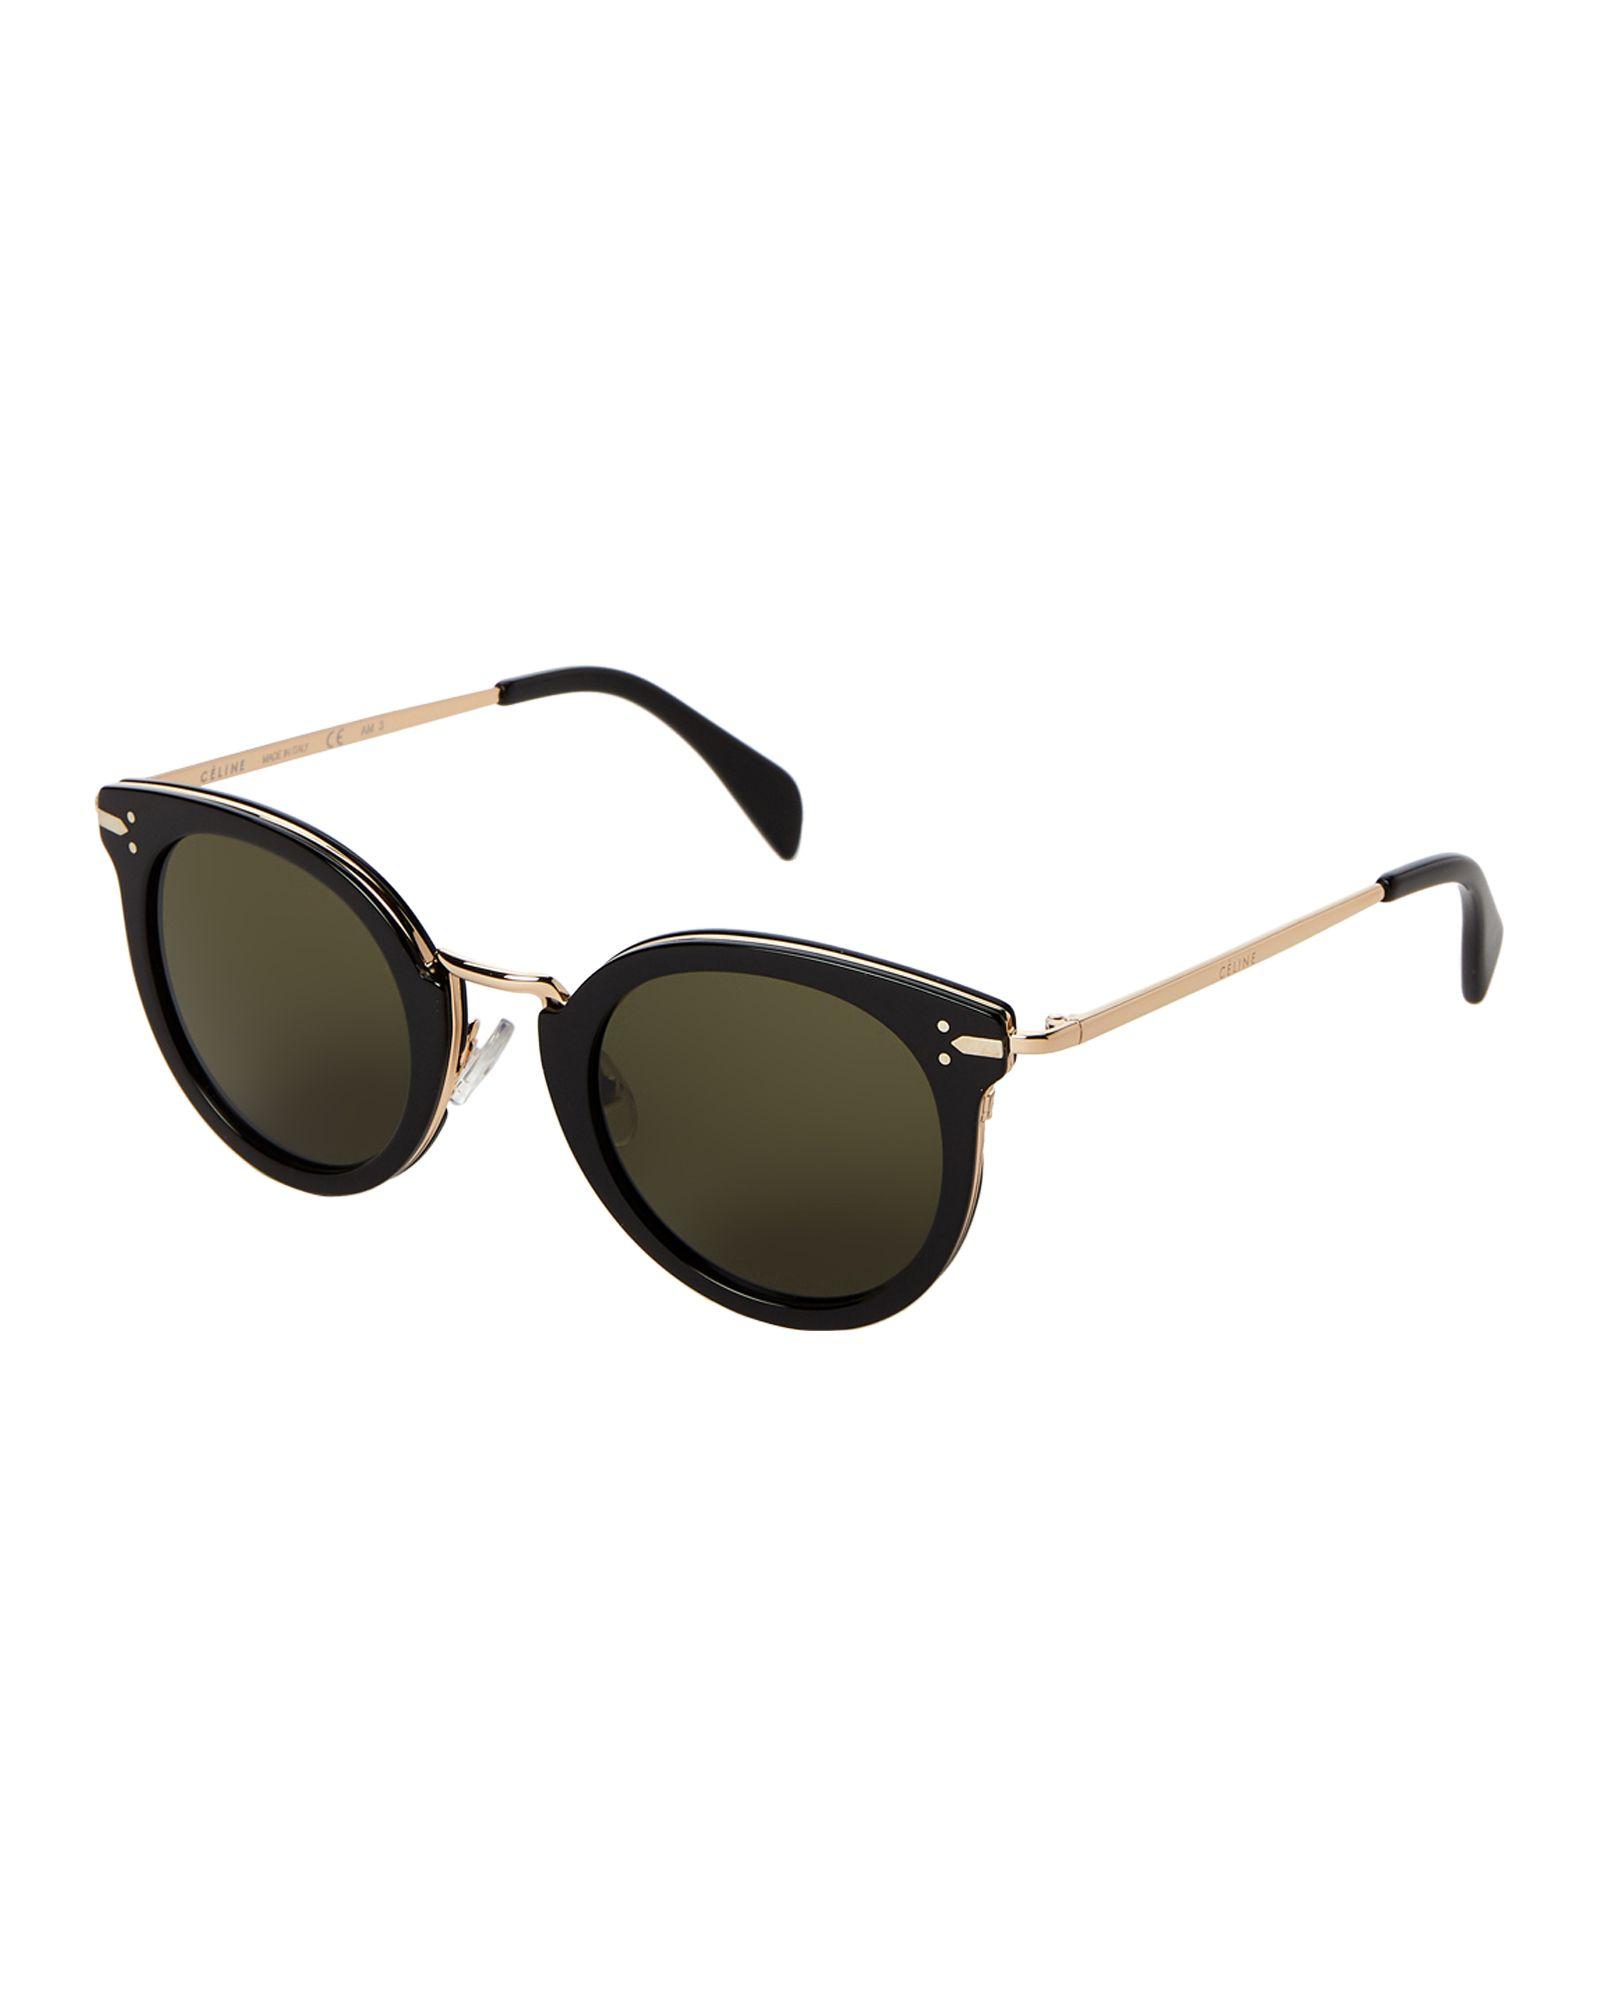 f770515a5abd Celine CL 41373 S Black   Gold-Tone Round Sunglasses